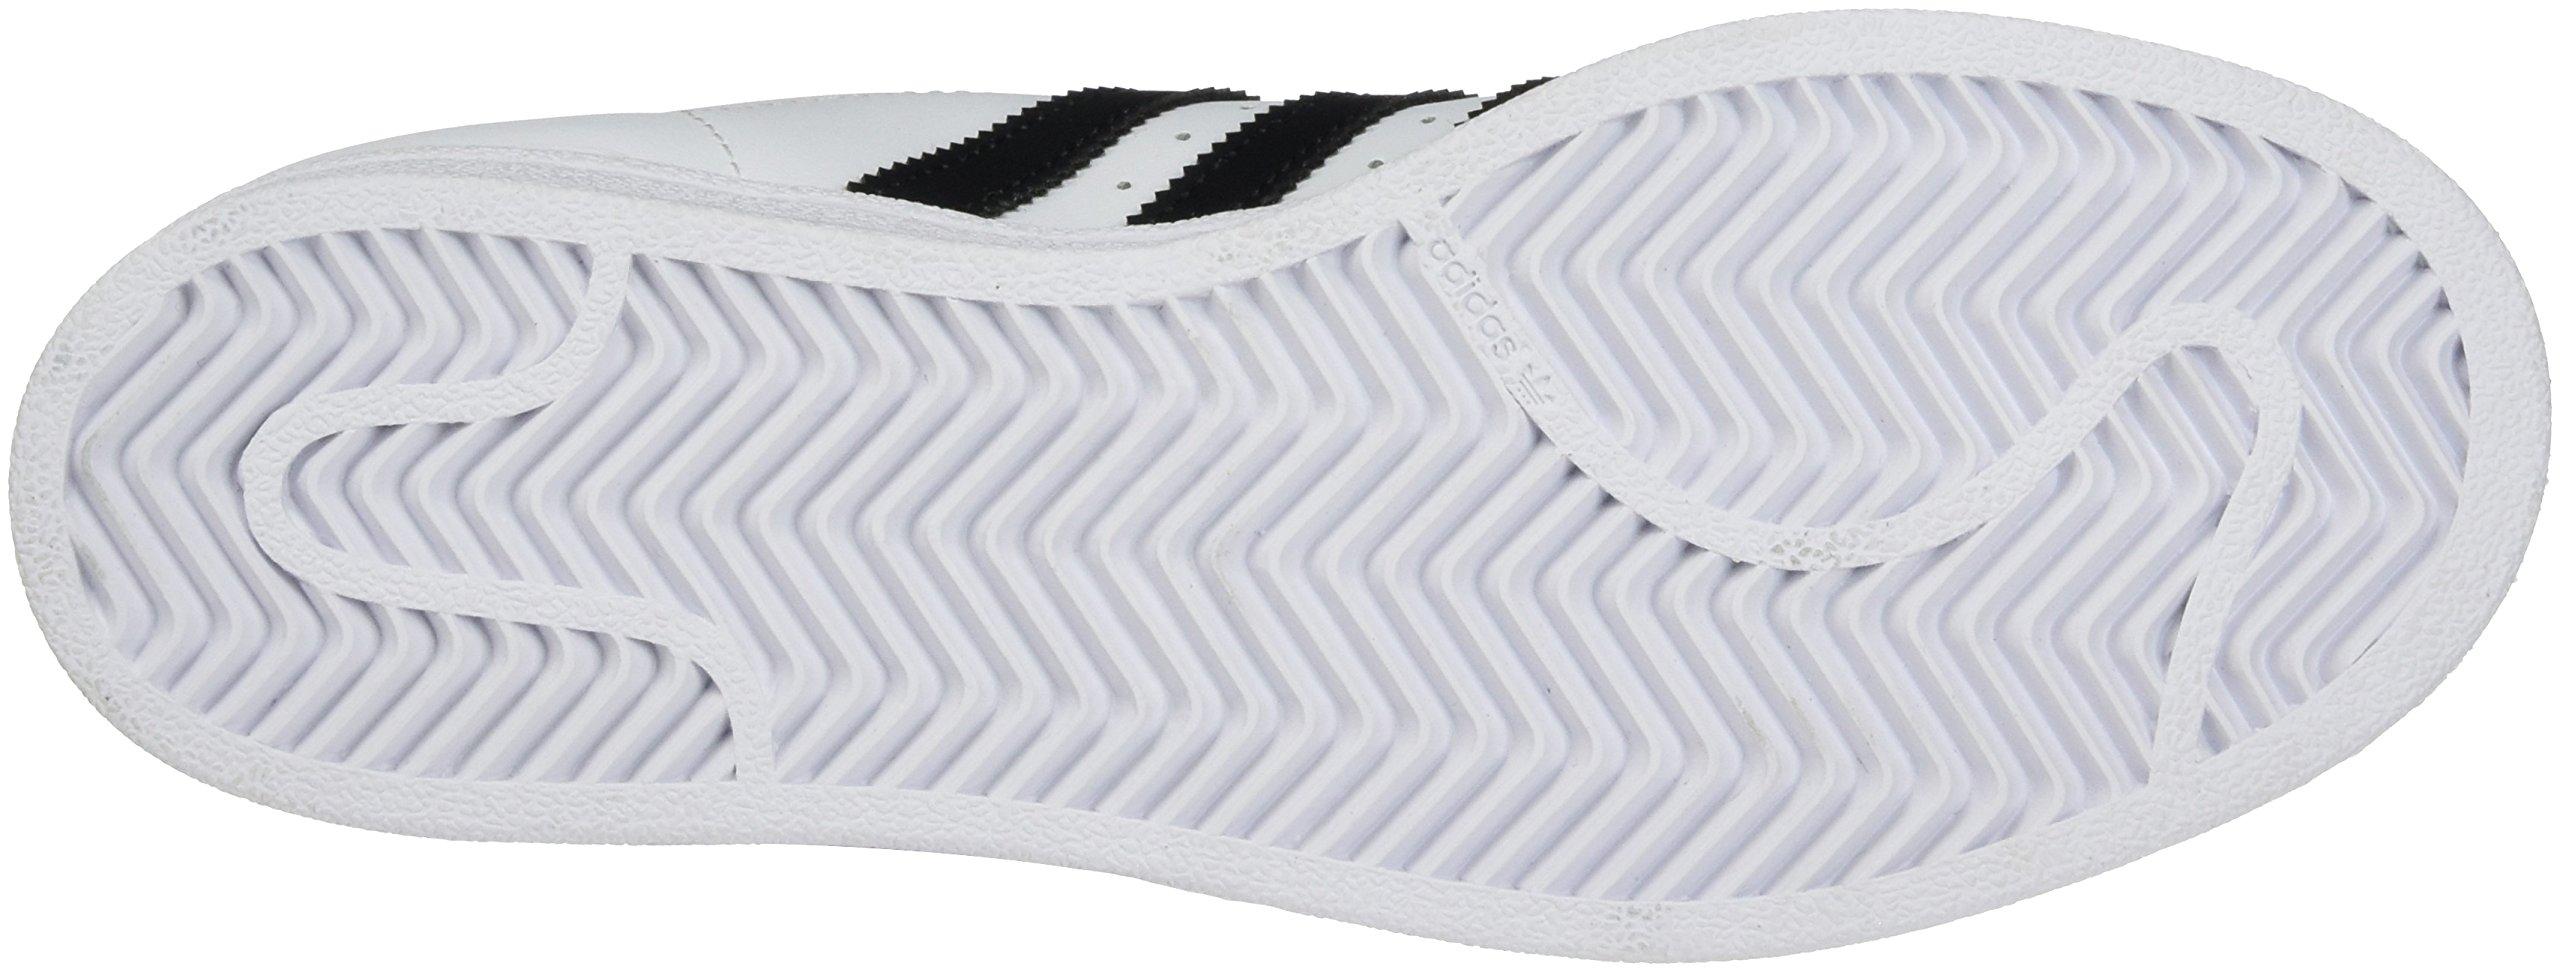 adidas Originals Superstar J Casual Low-Cut Basketball Sneaker (Big Kid) 1410bcffe